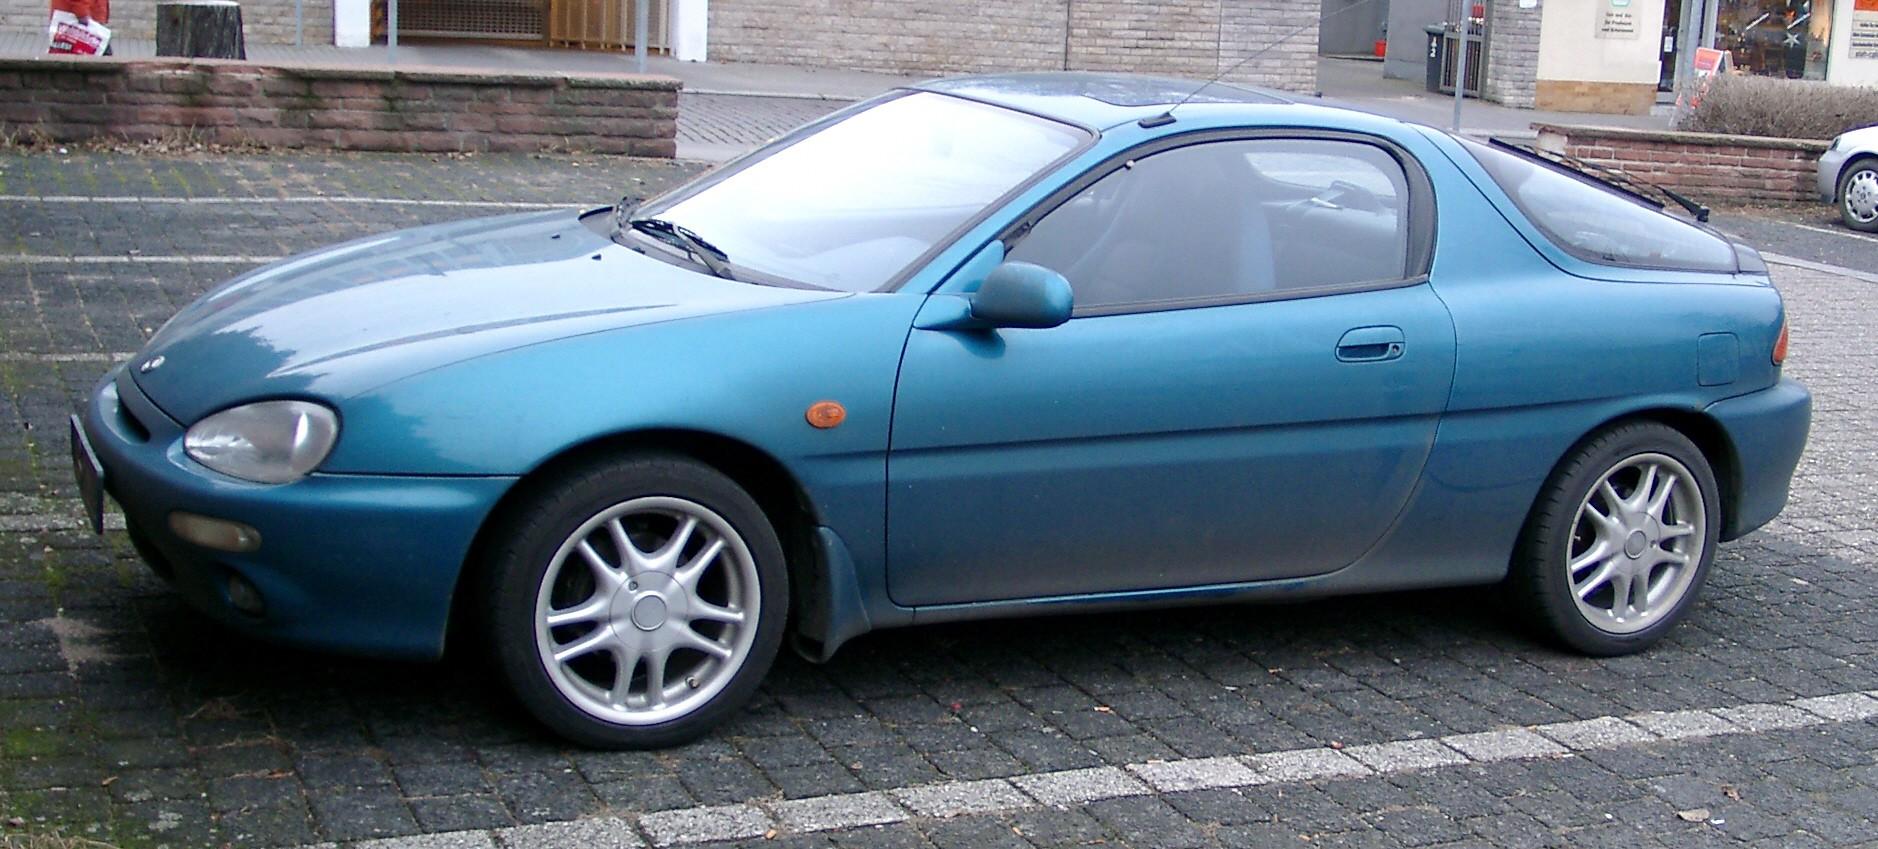 Would You Eco Mod A Mazda Mx 3 Fuel Economy Hypermiling Ecomodding News And Forum